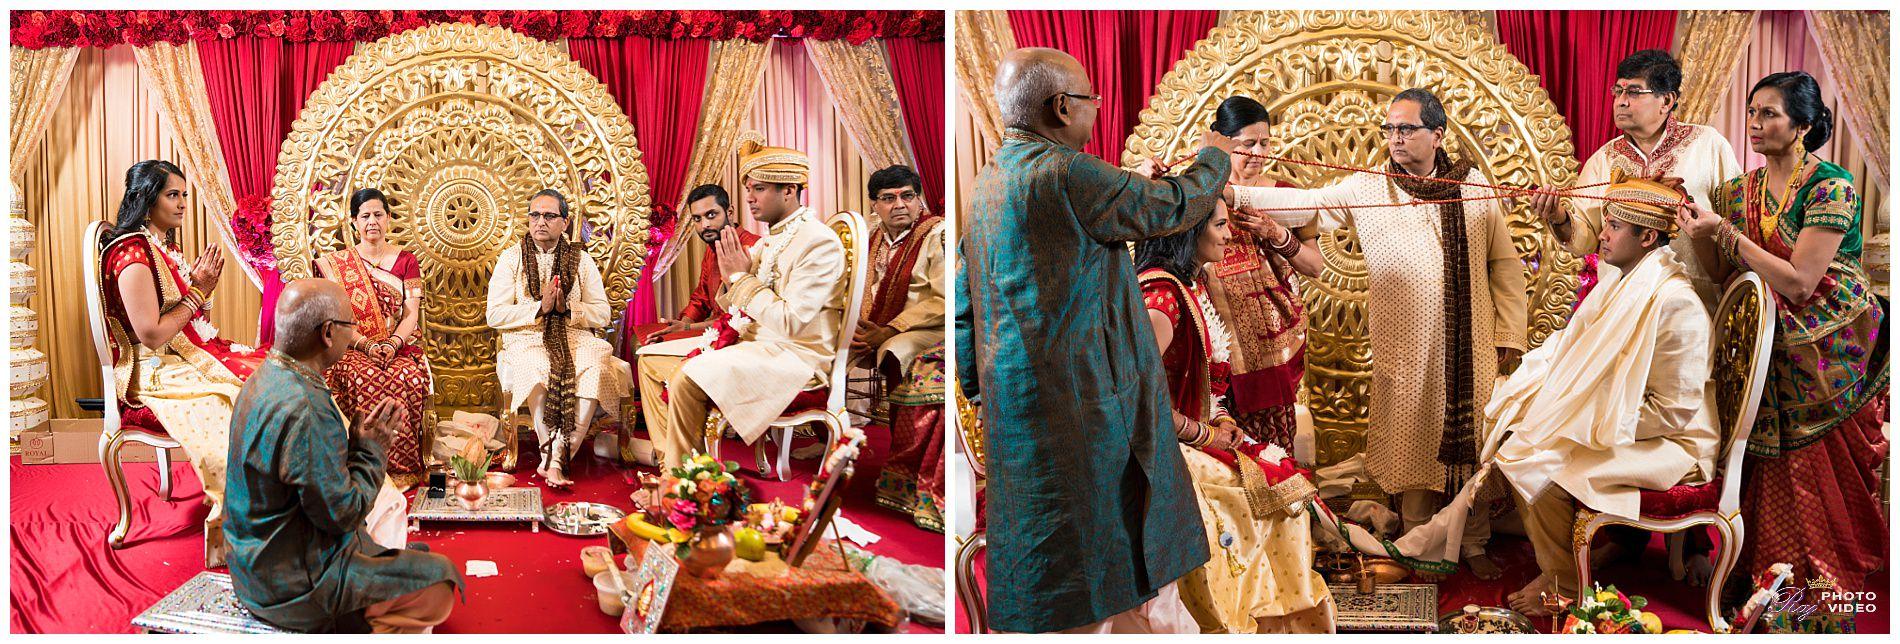 Martinsville-Gardens-NJ-Indian-Wedding-Ruchi-Vishal-26.jpg